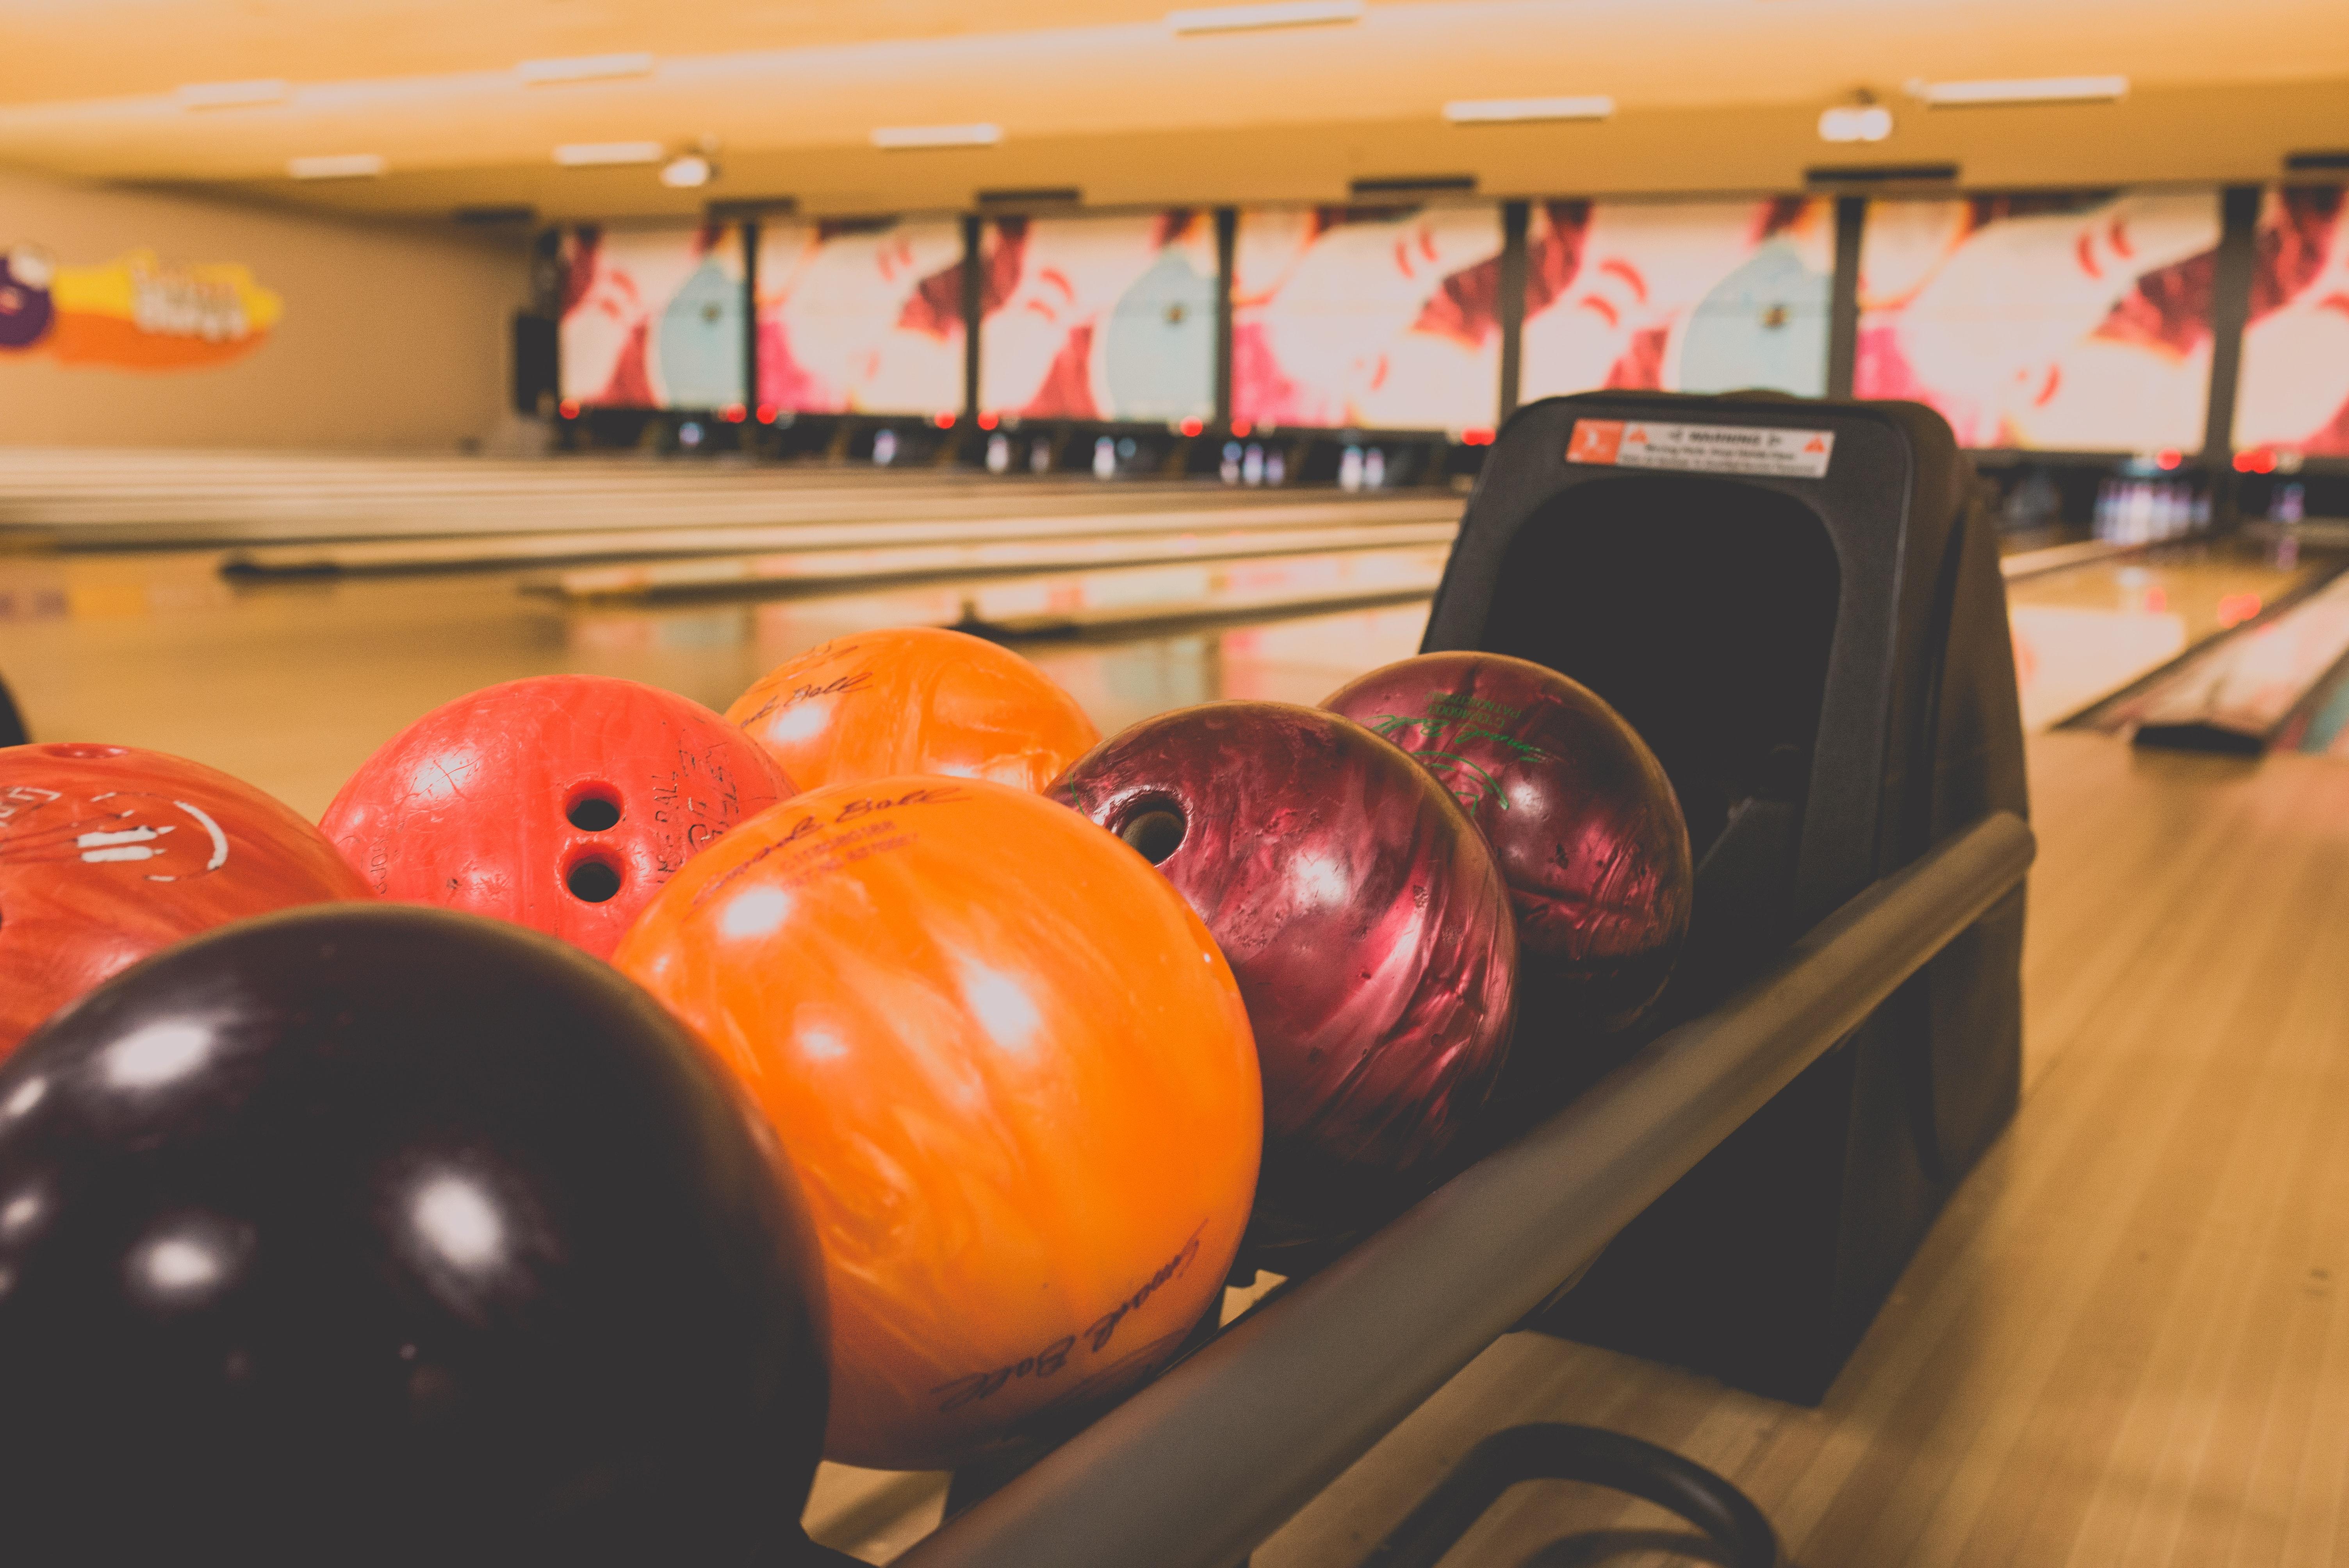 Bowling balls and lanes